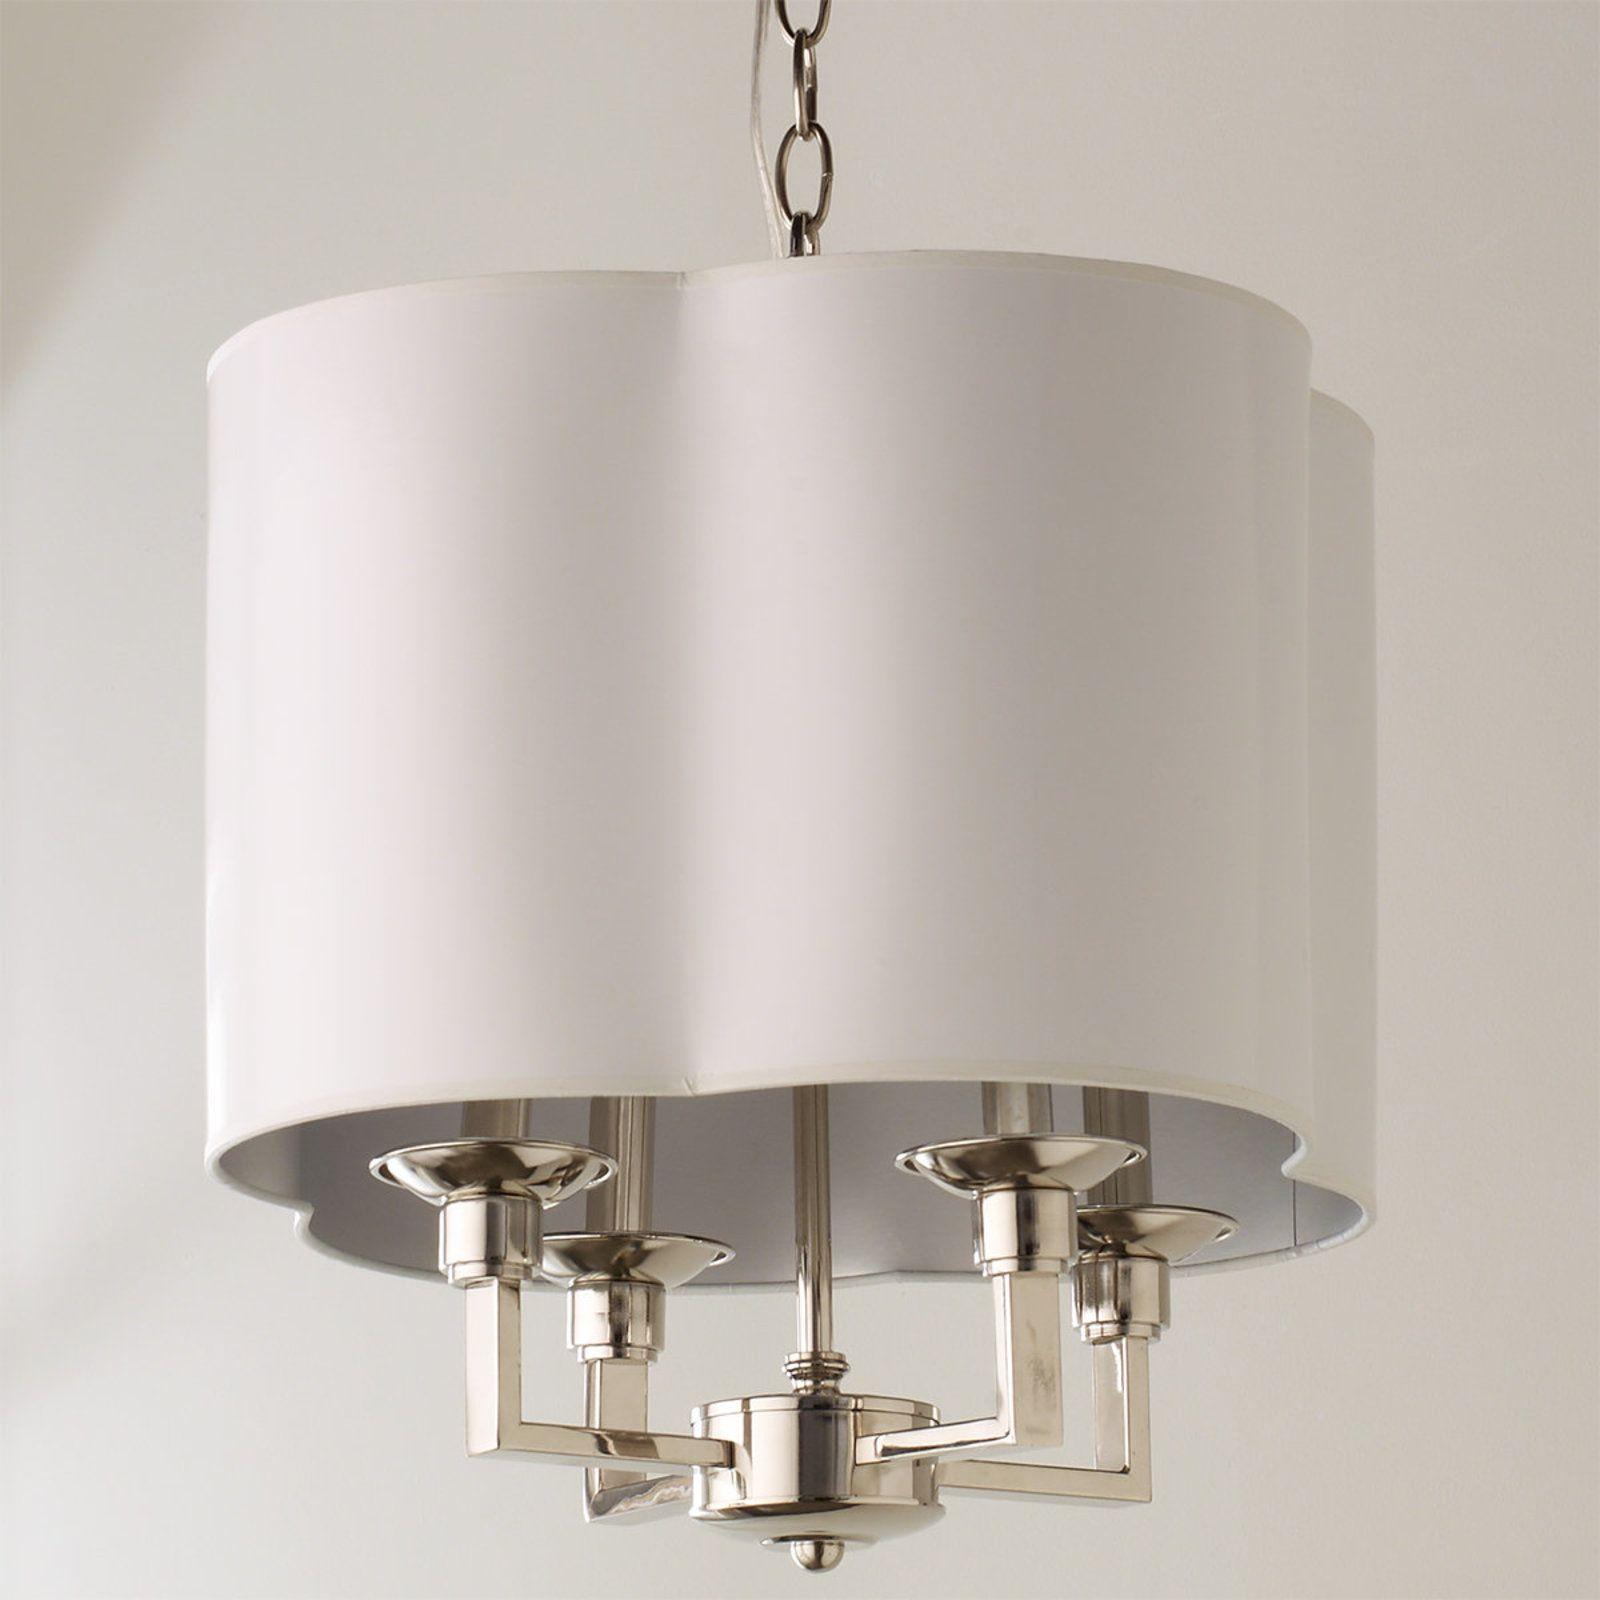 Quatrefoil shade mini chandelier mini chandelier quatrefoil and lights quatrefoil shade mini chandelier whitepaperwithsilverlining arubaitofo Choice Image